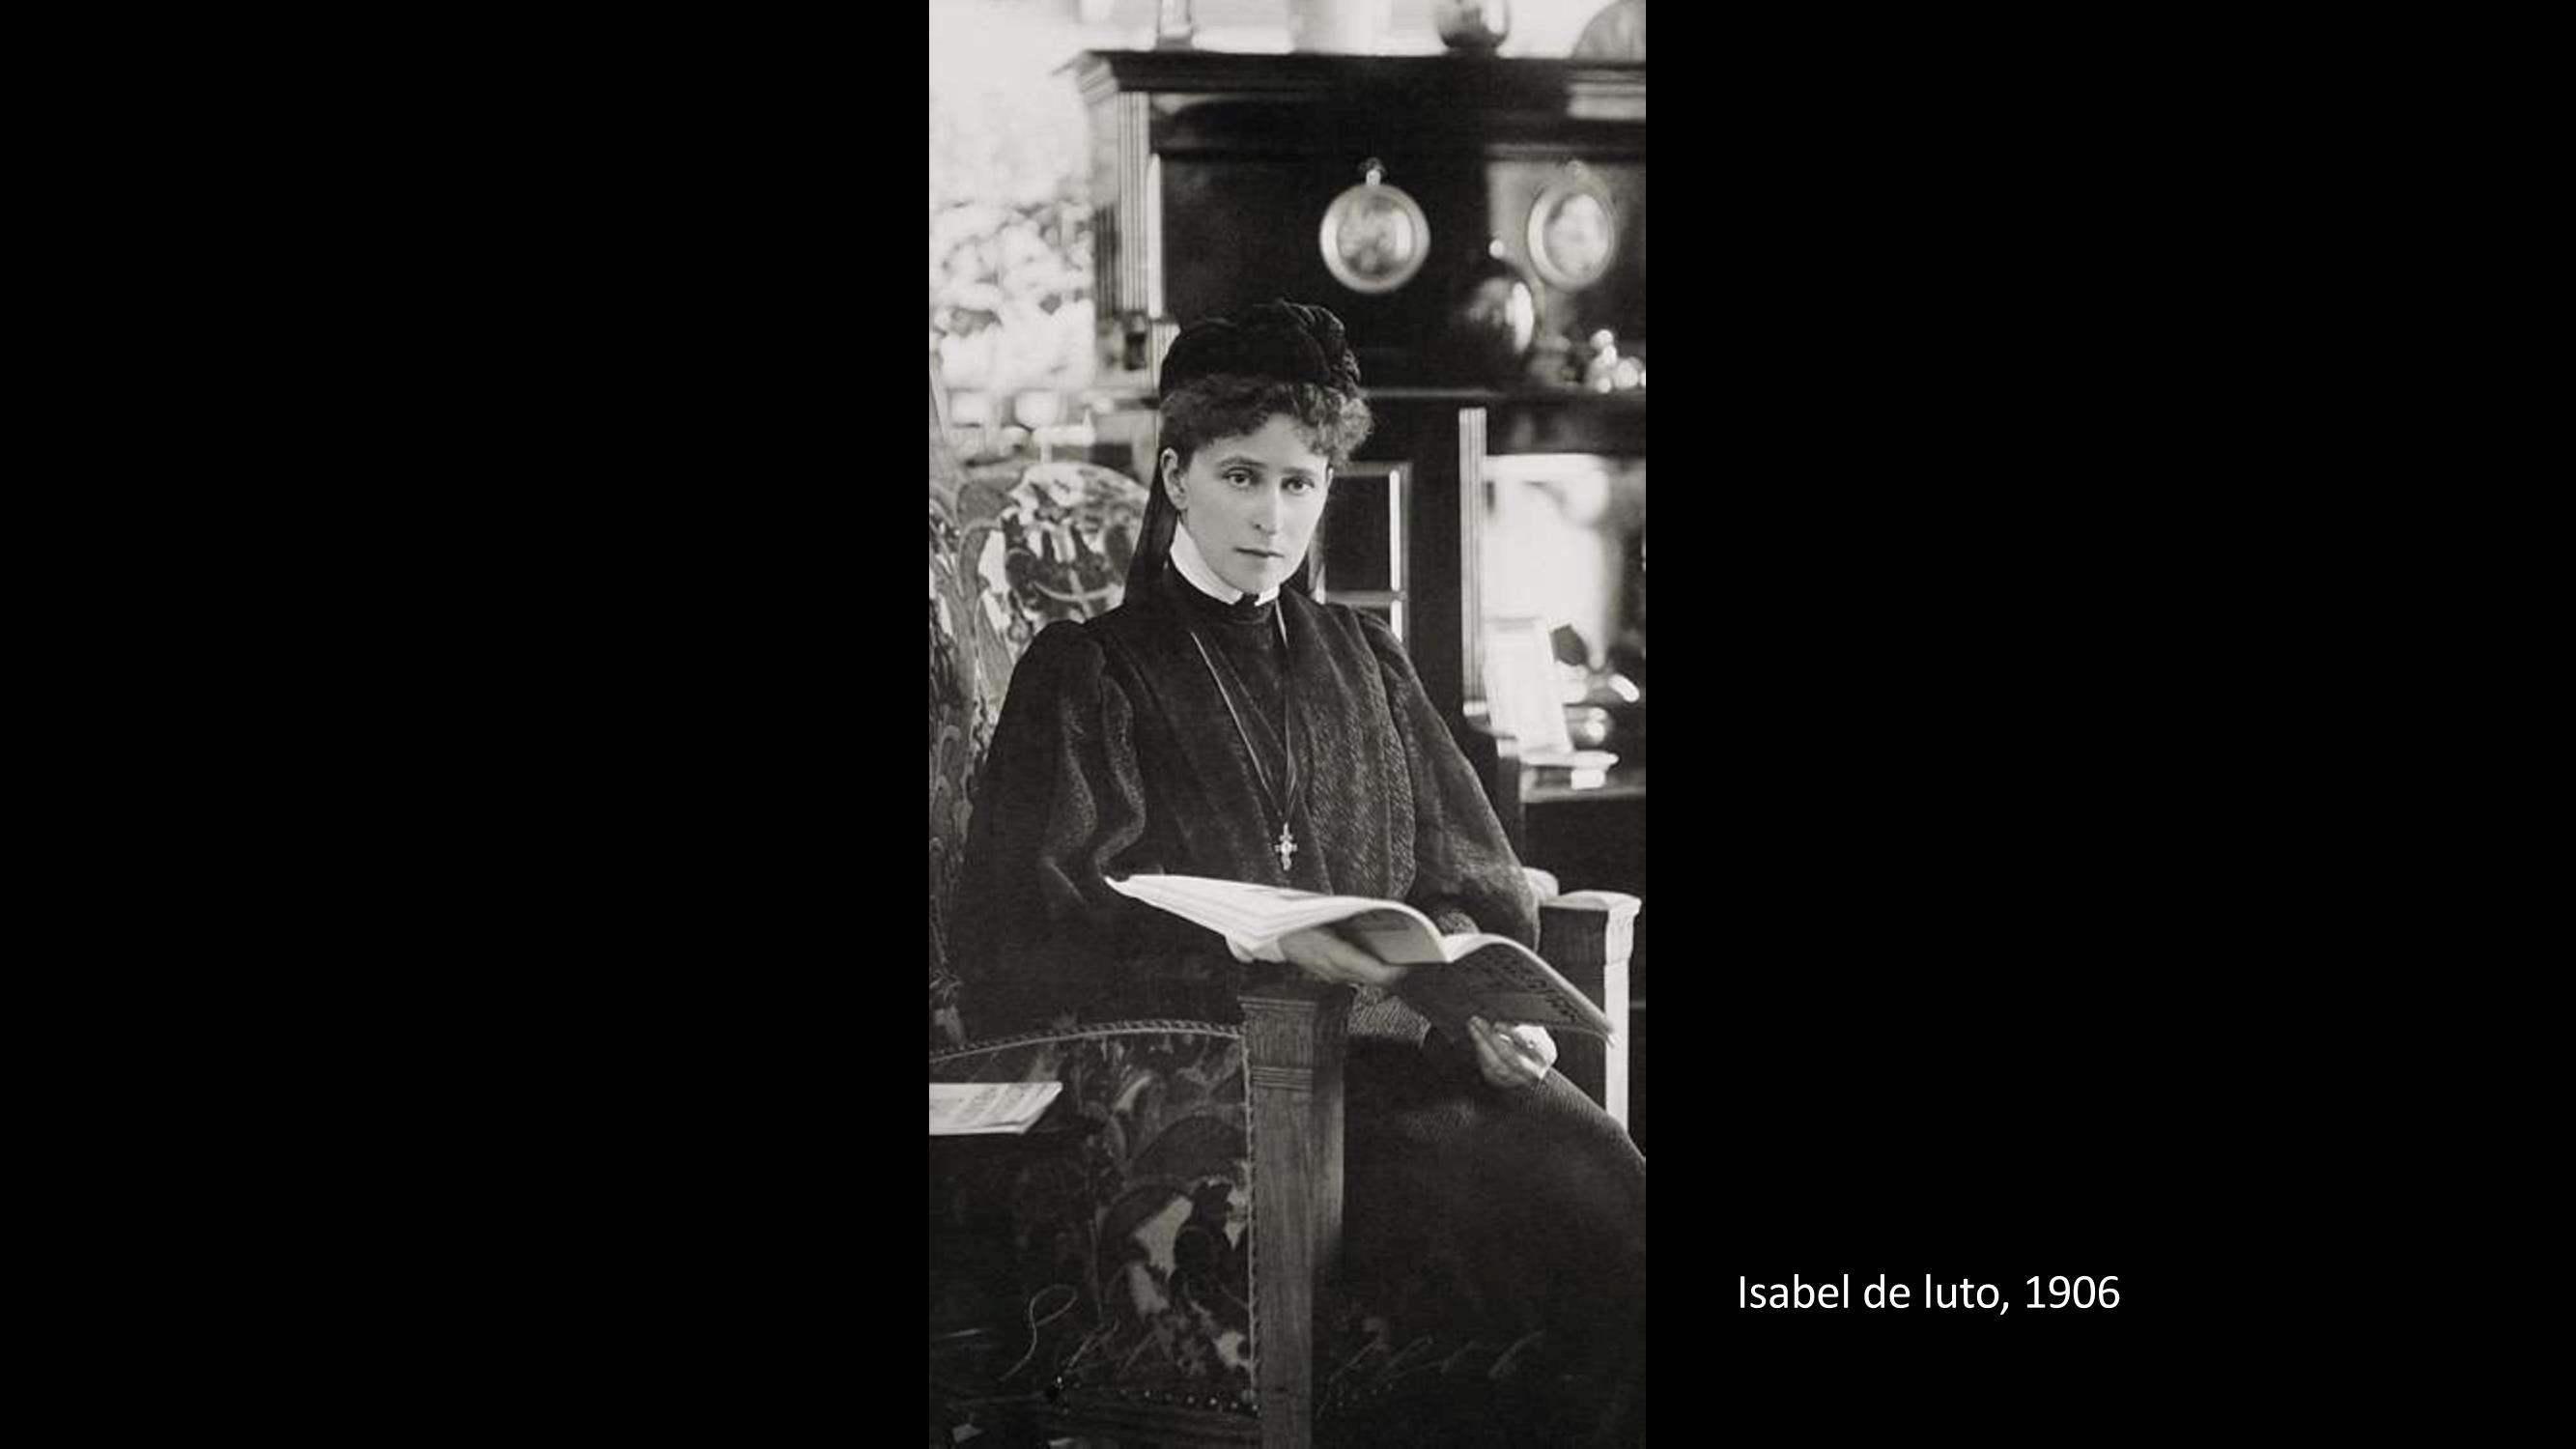 [14] Isabel de luto, 1906